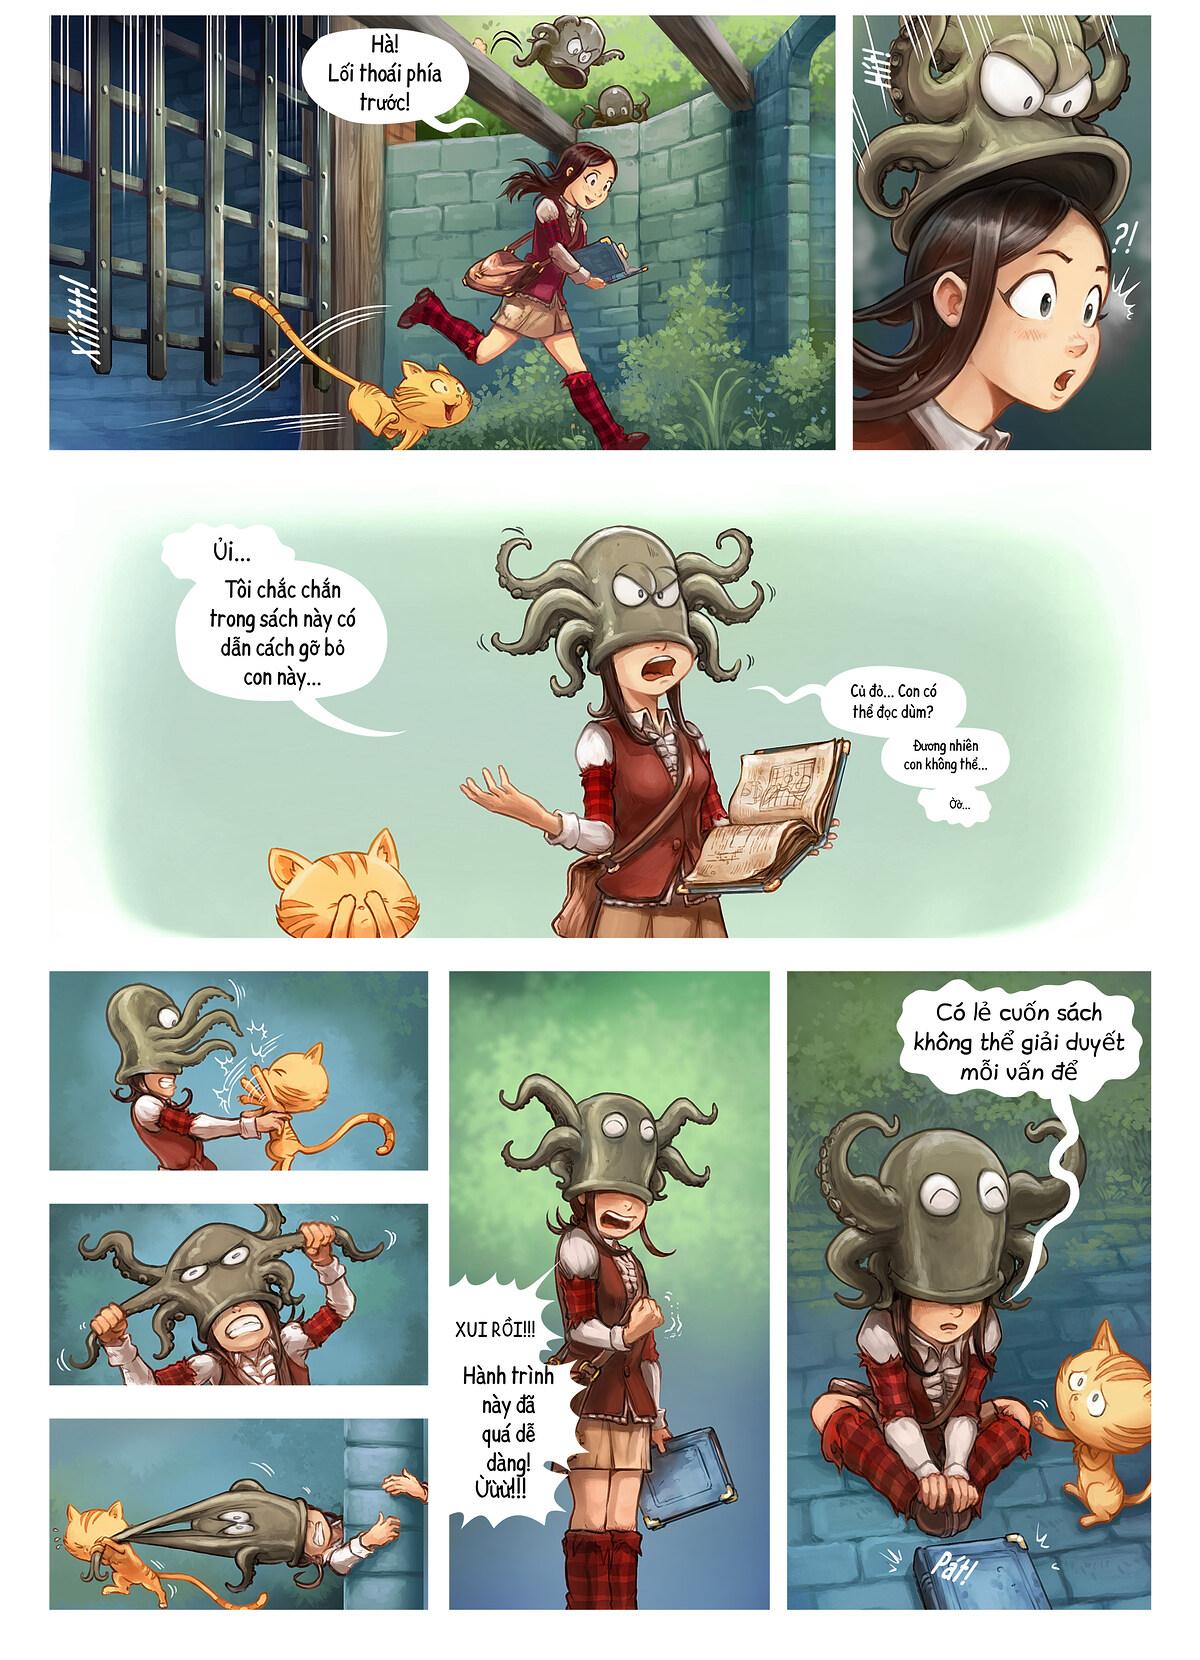 A webcomic page of Pepper&Carrot, Tập 26 [vi], trang 5